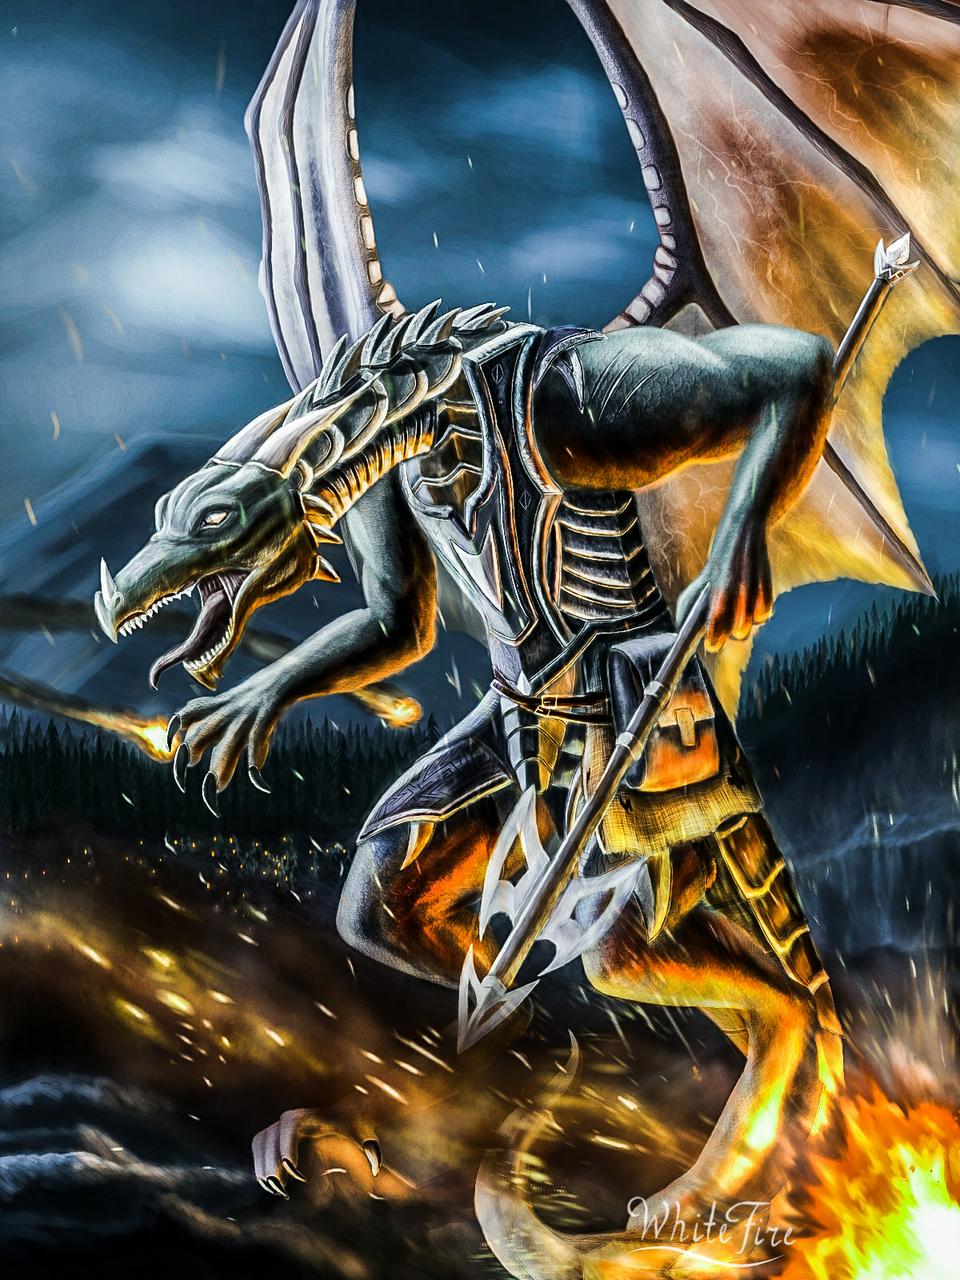 Dragon warrior oc Illust of ℤ𝕖𝕟𝕜𝕒𝕥𝕒𝕣 fantasy battle medibangpaint dragon epic fire knight realistic oc warrior